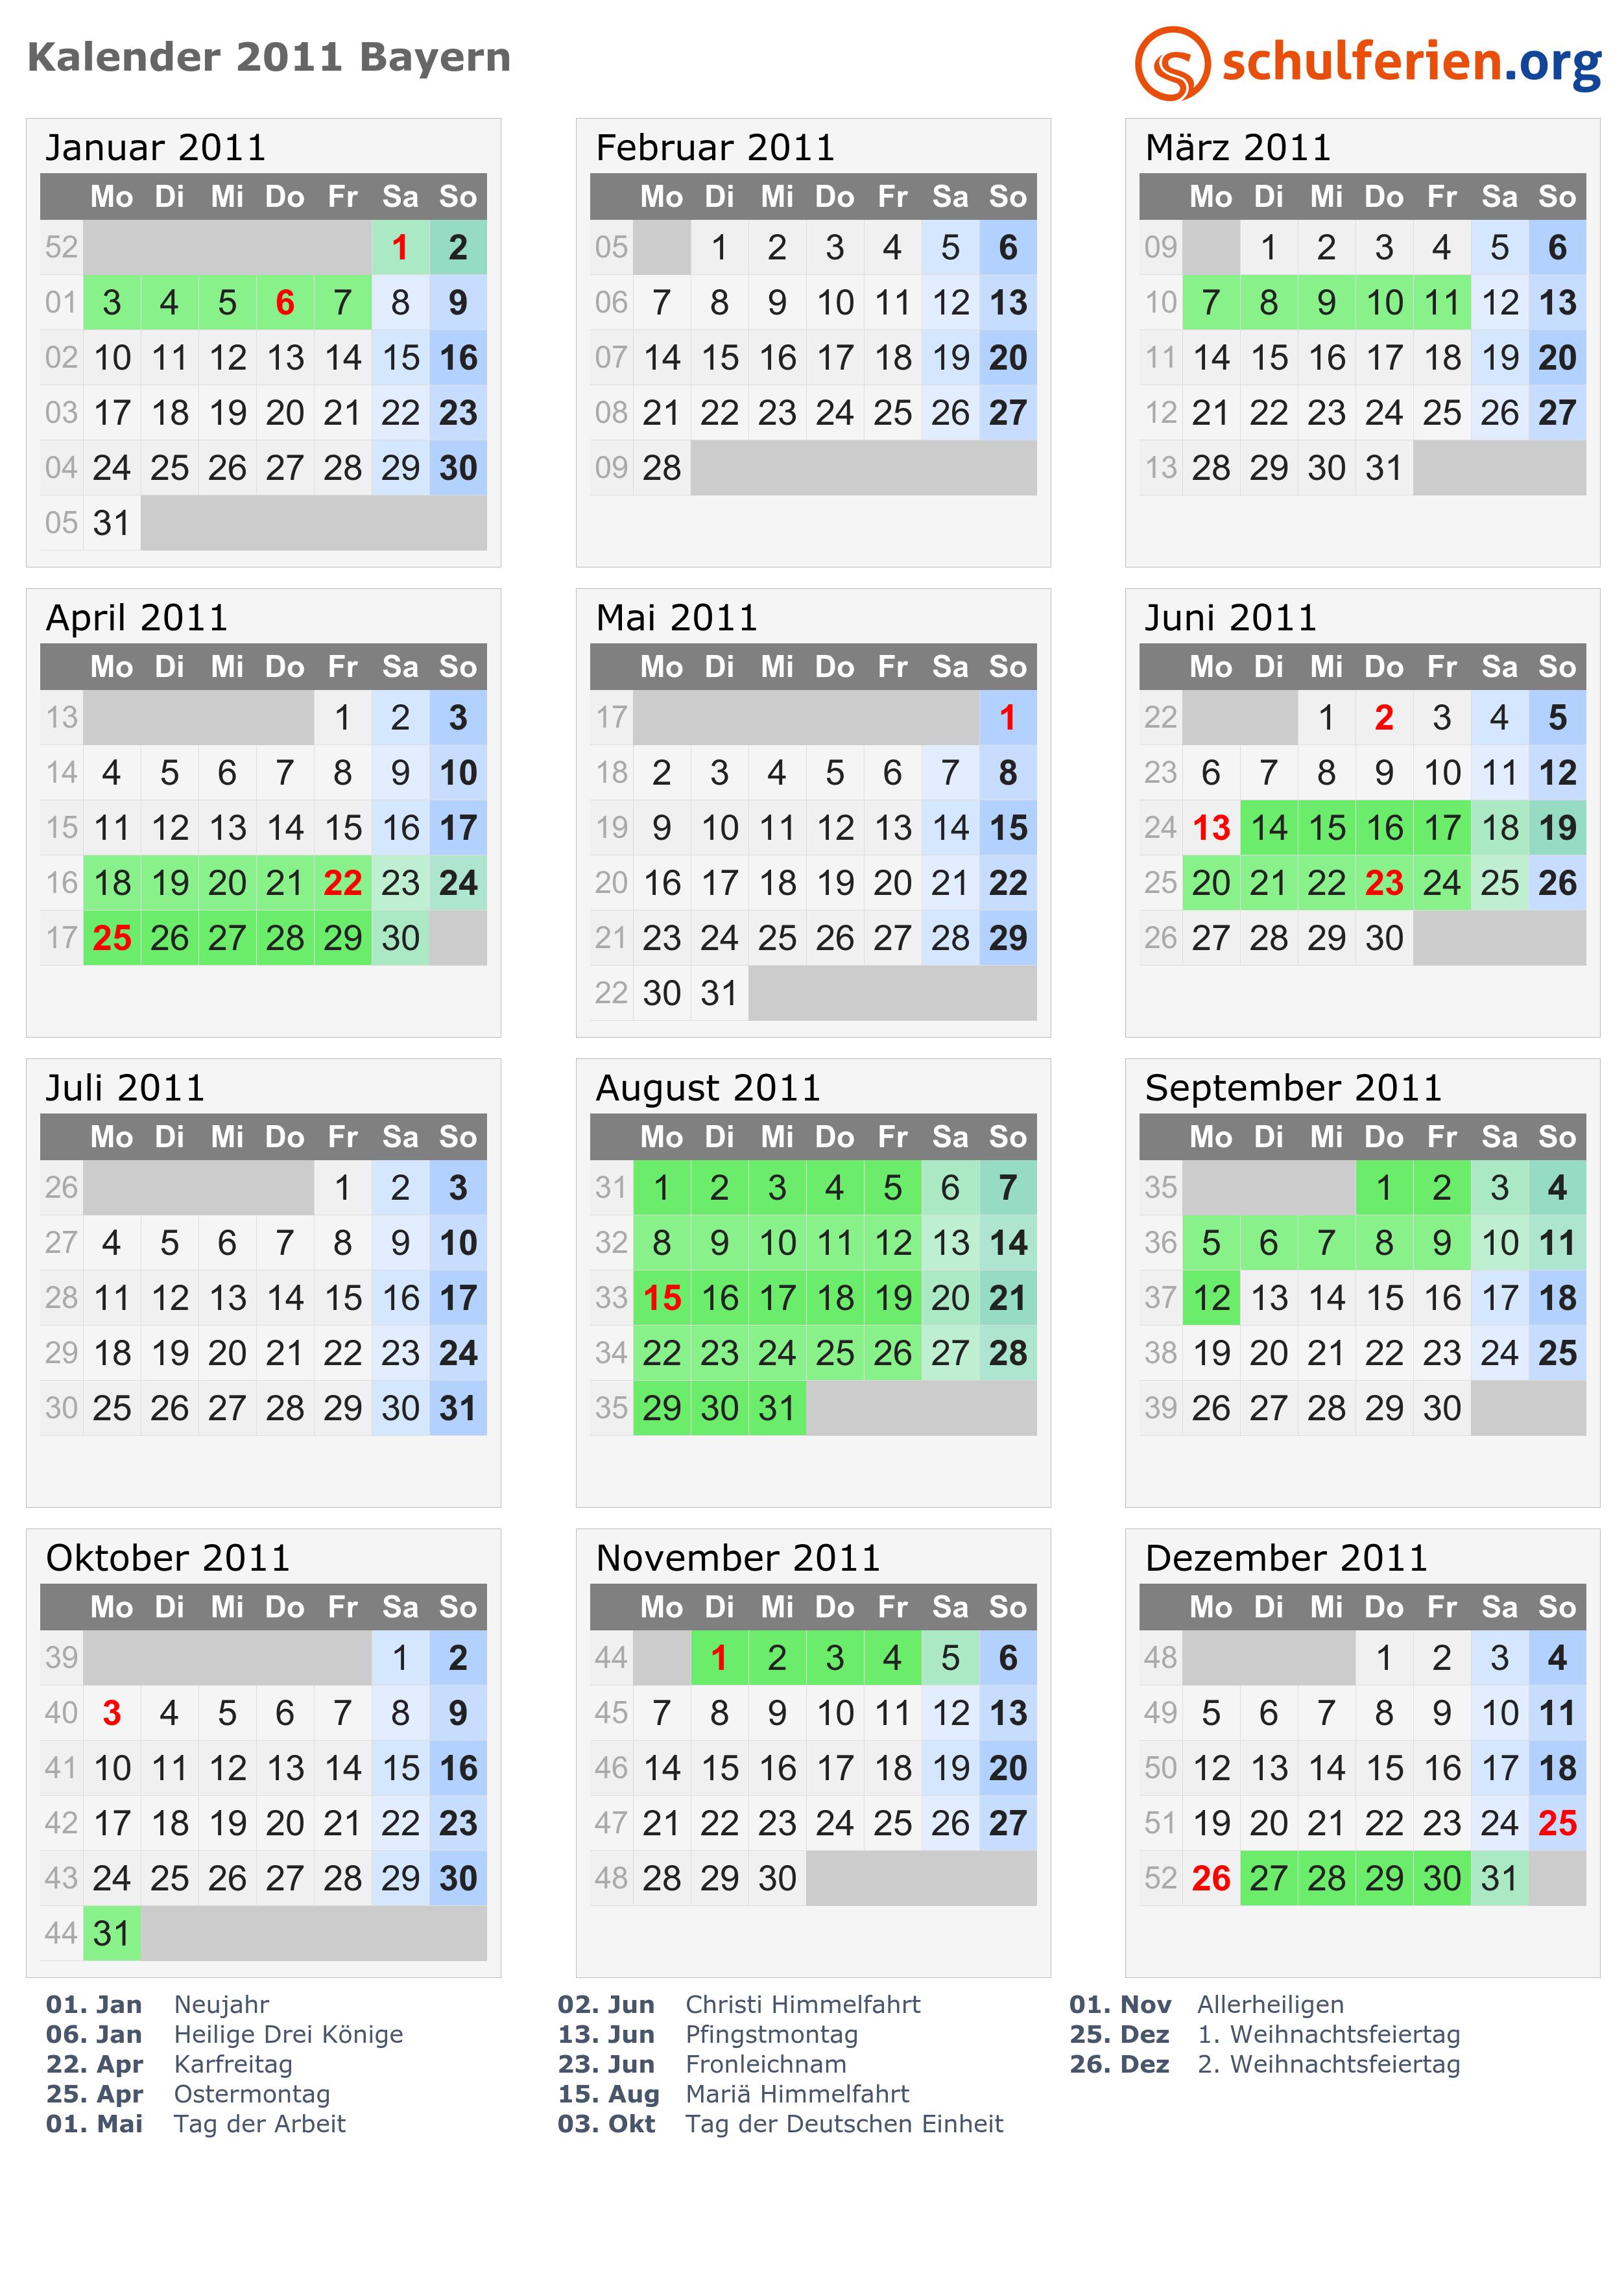 ostern 2011 datum